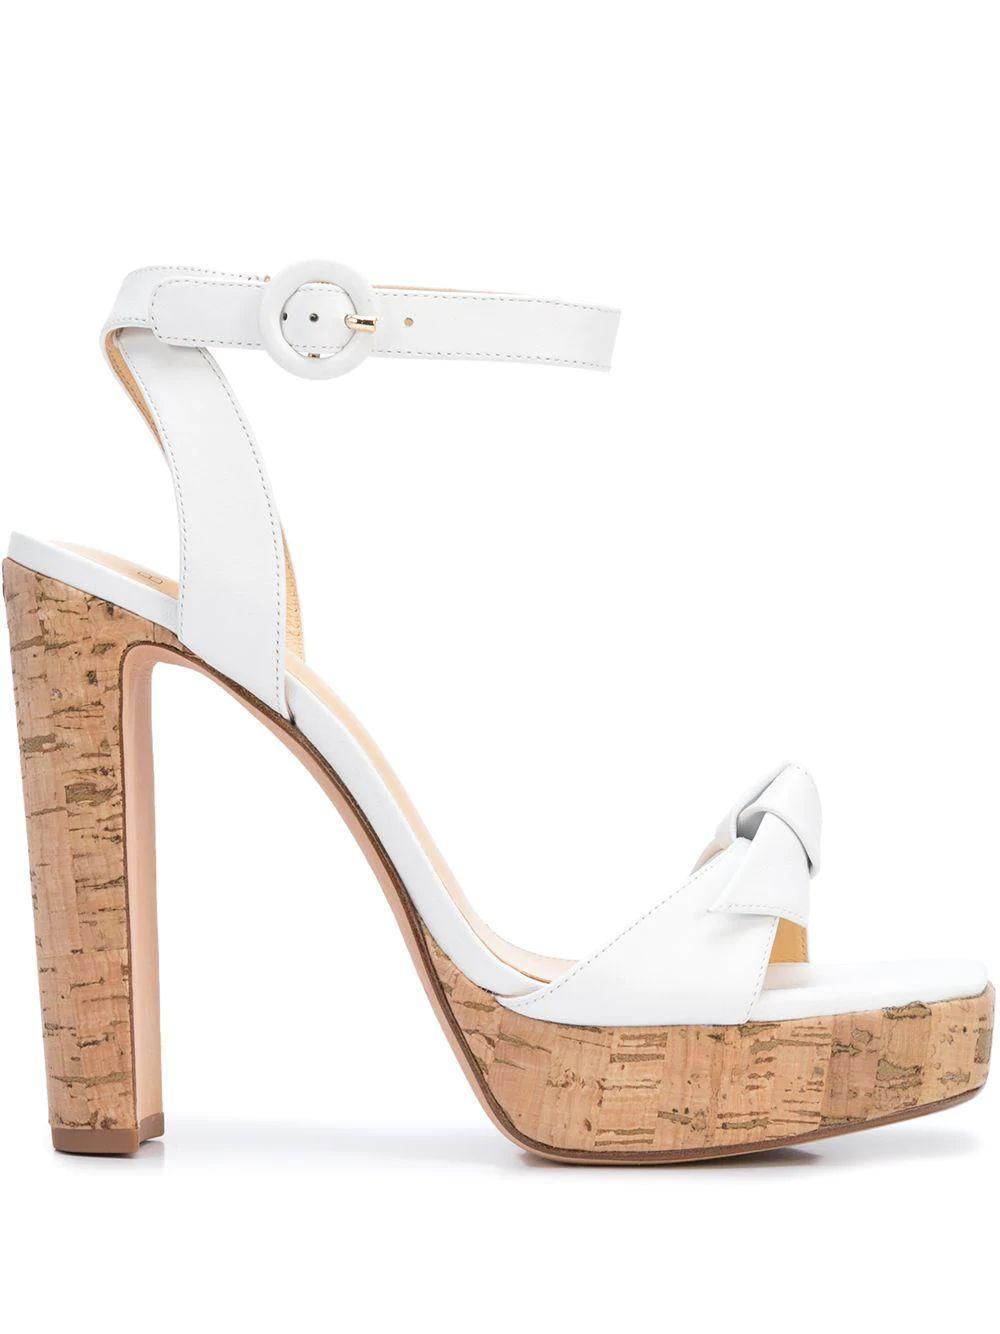 Clarita 120mm Platform Sandal Item # B3530300100001